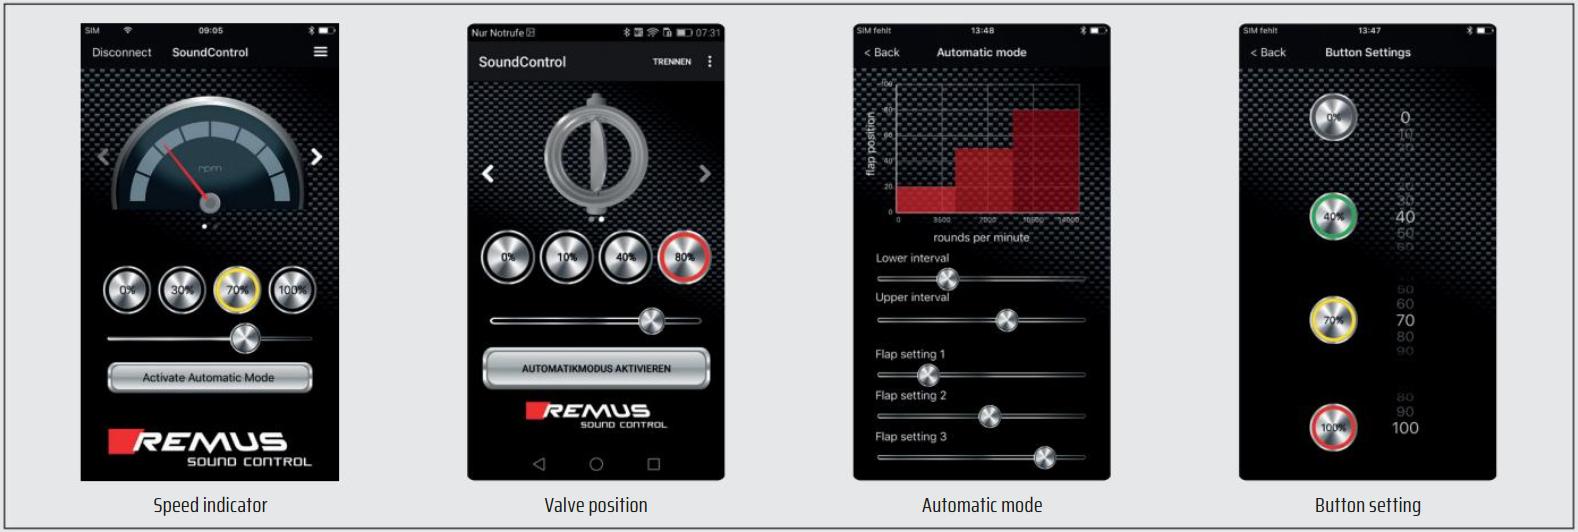 Remus Sound Control App